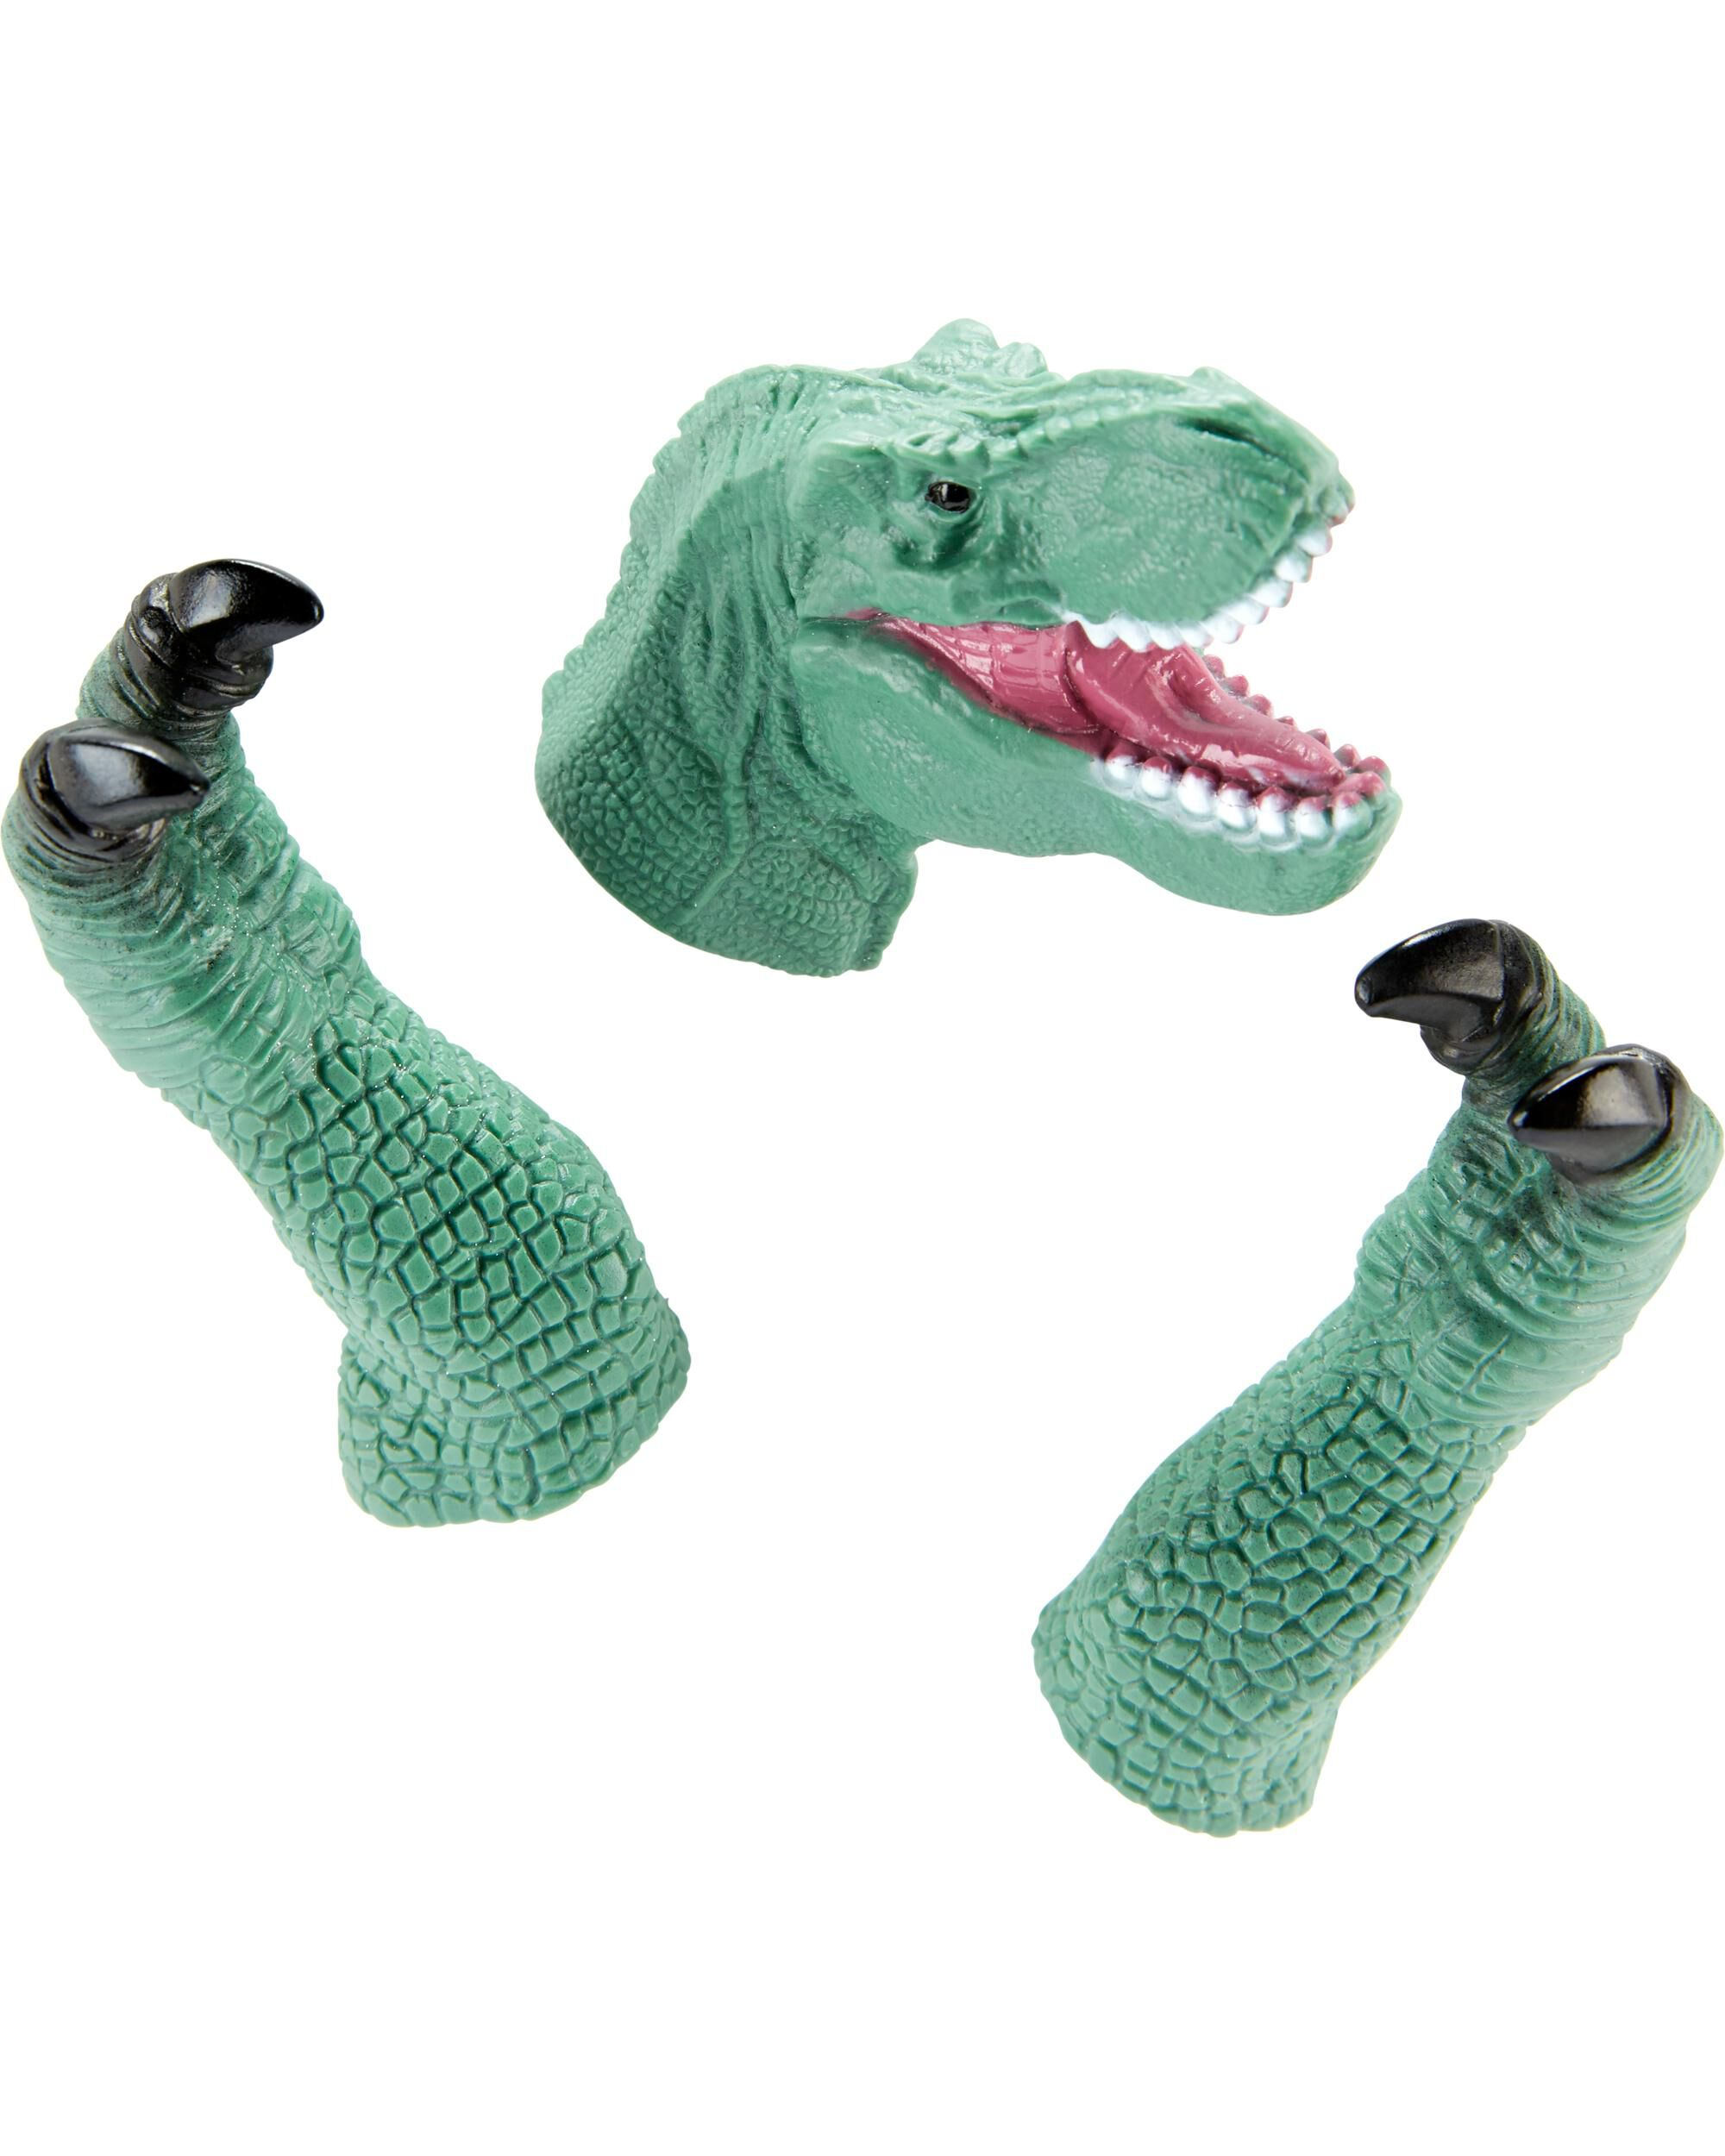 24bee5ebf Dino Finger Puppets. Loading zoom